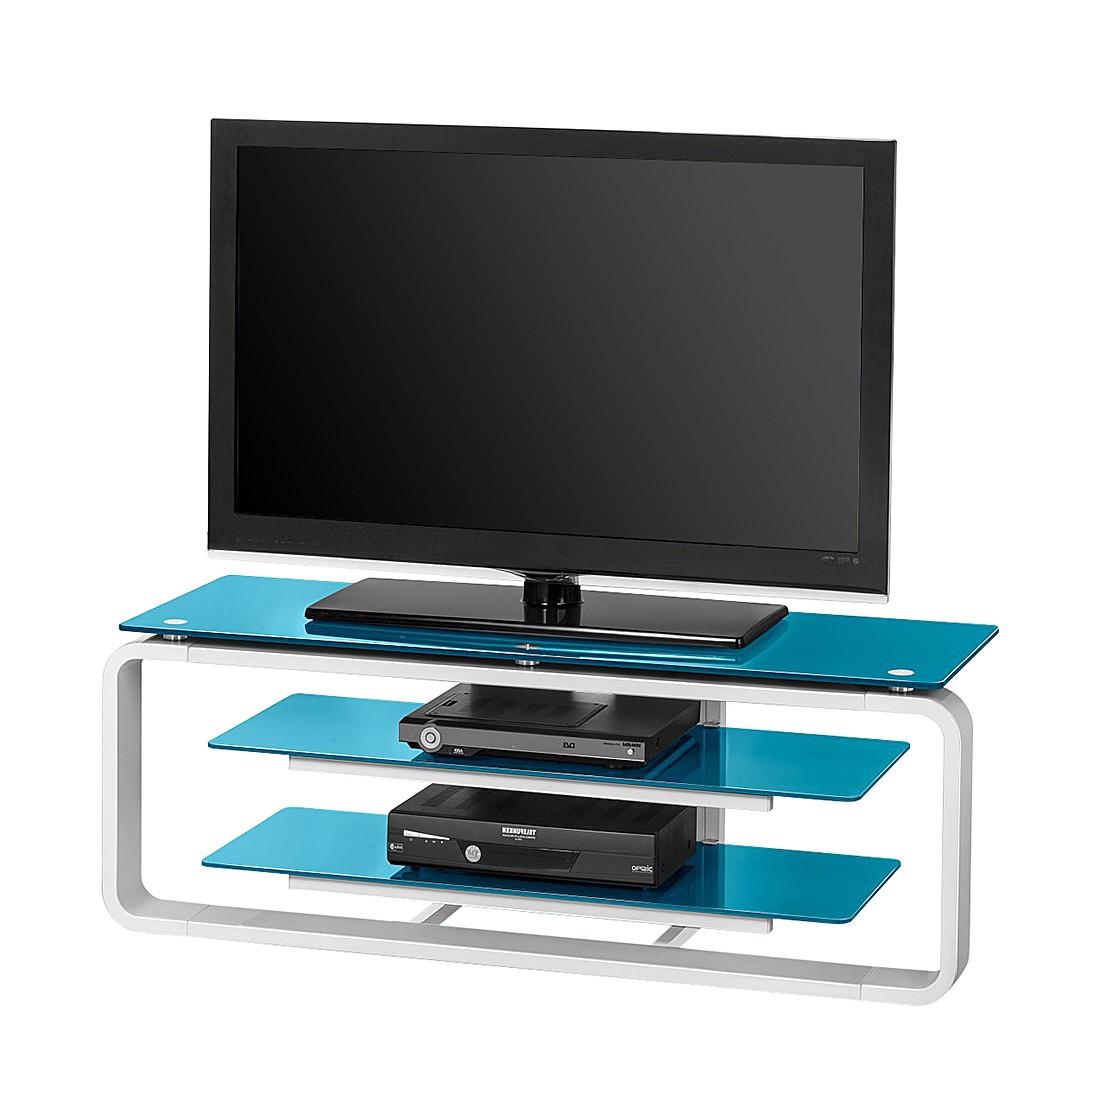 tv rack weiss preisvergleich die besten angebote online. Black Bedroom Furniture Sets. Home Design Ideas